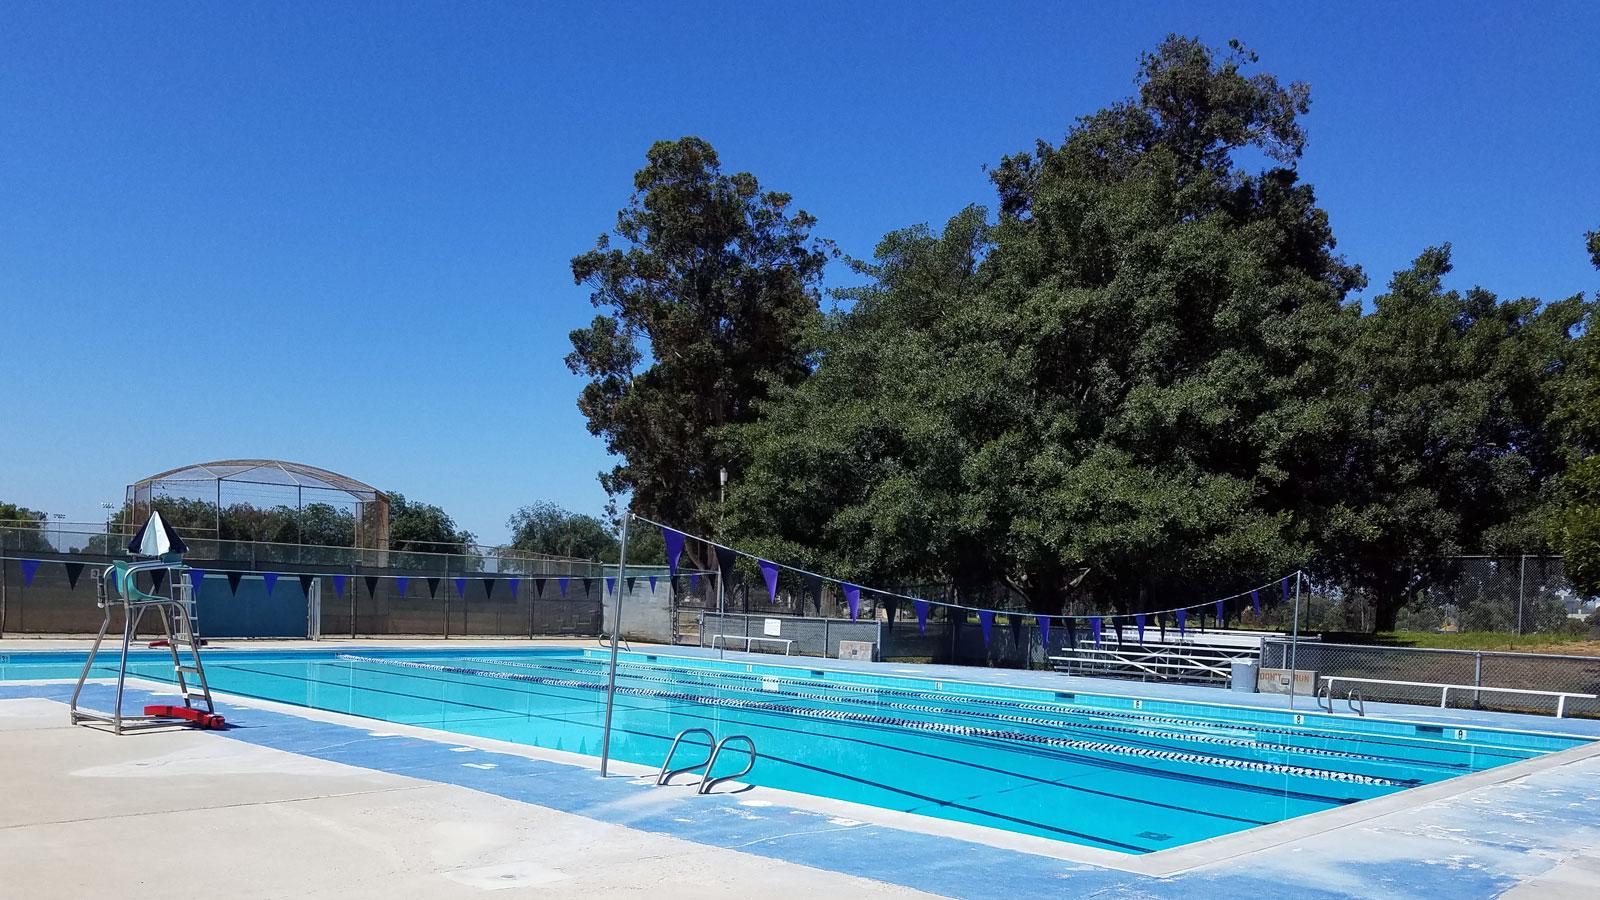 Kearny Mesa Pool City Of San Diego Official Website